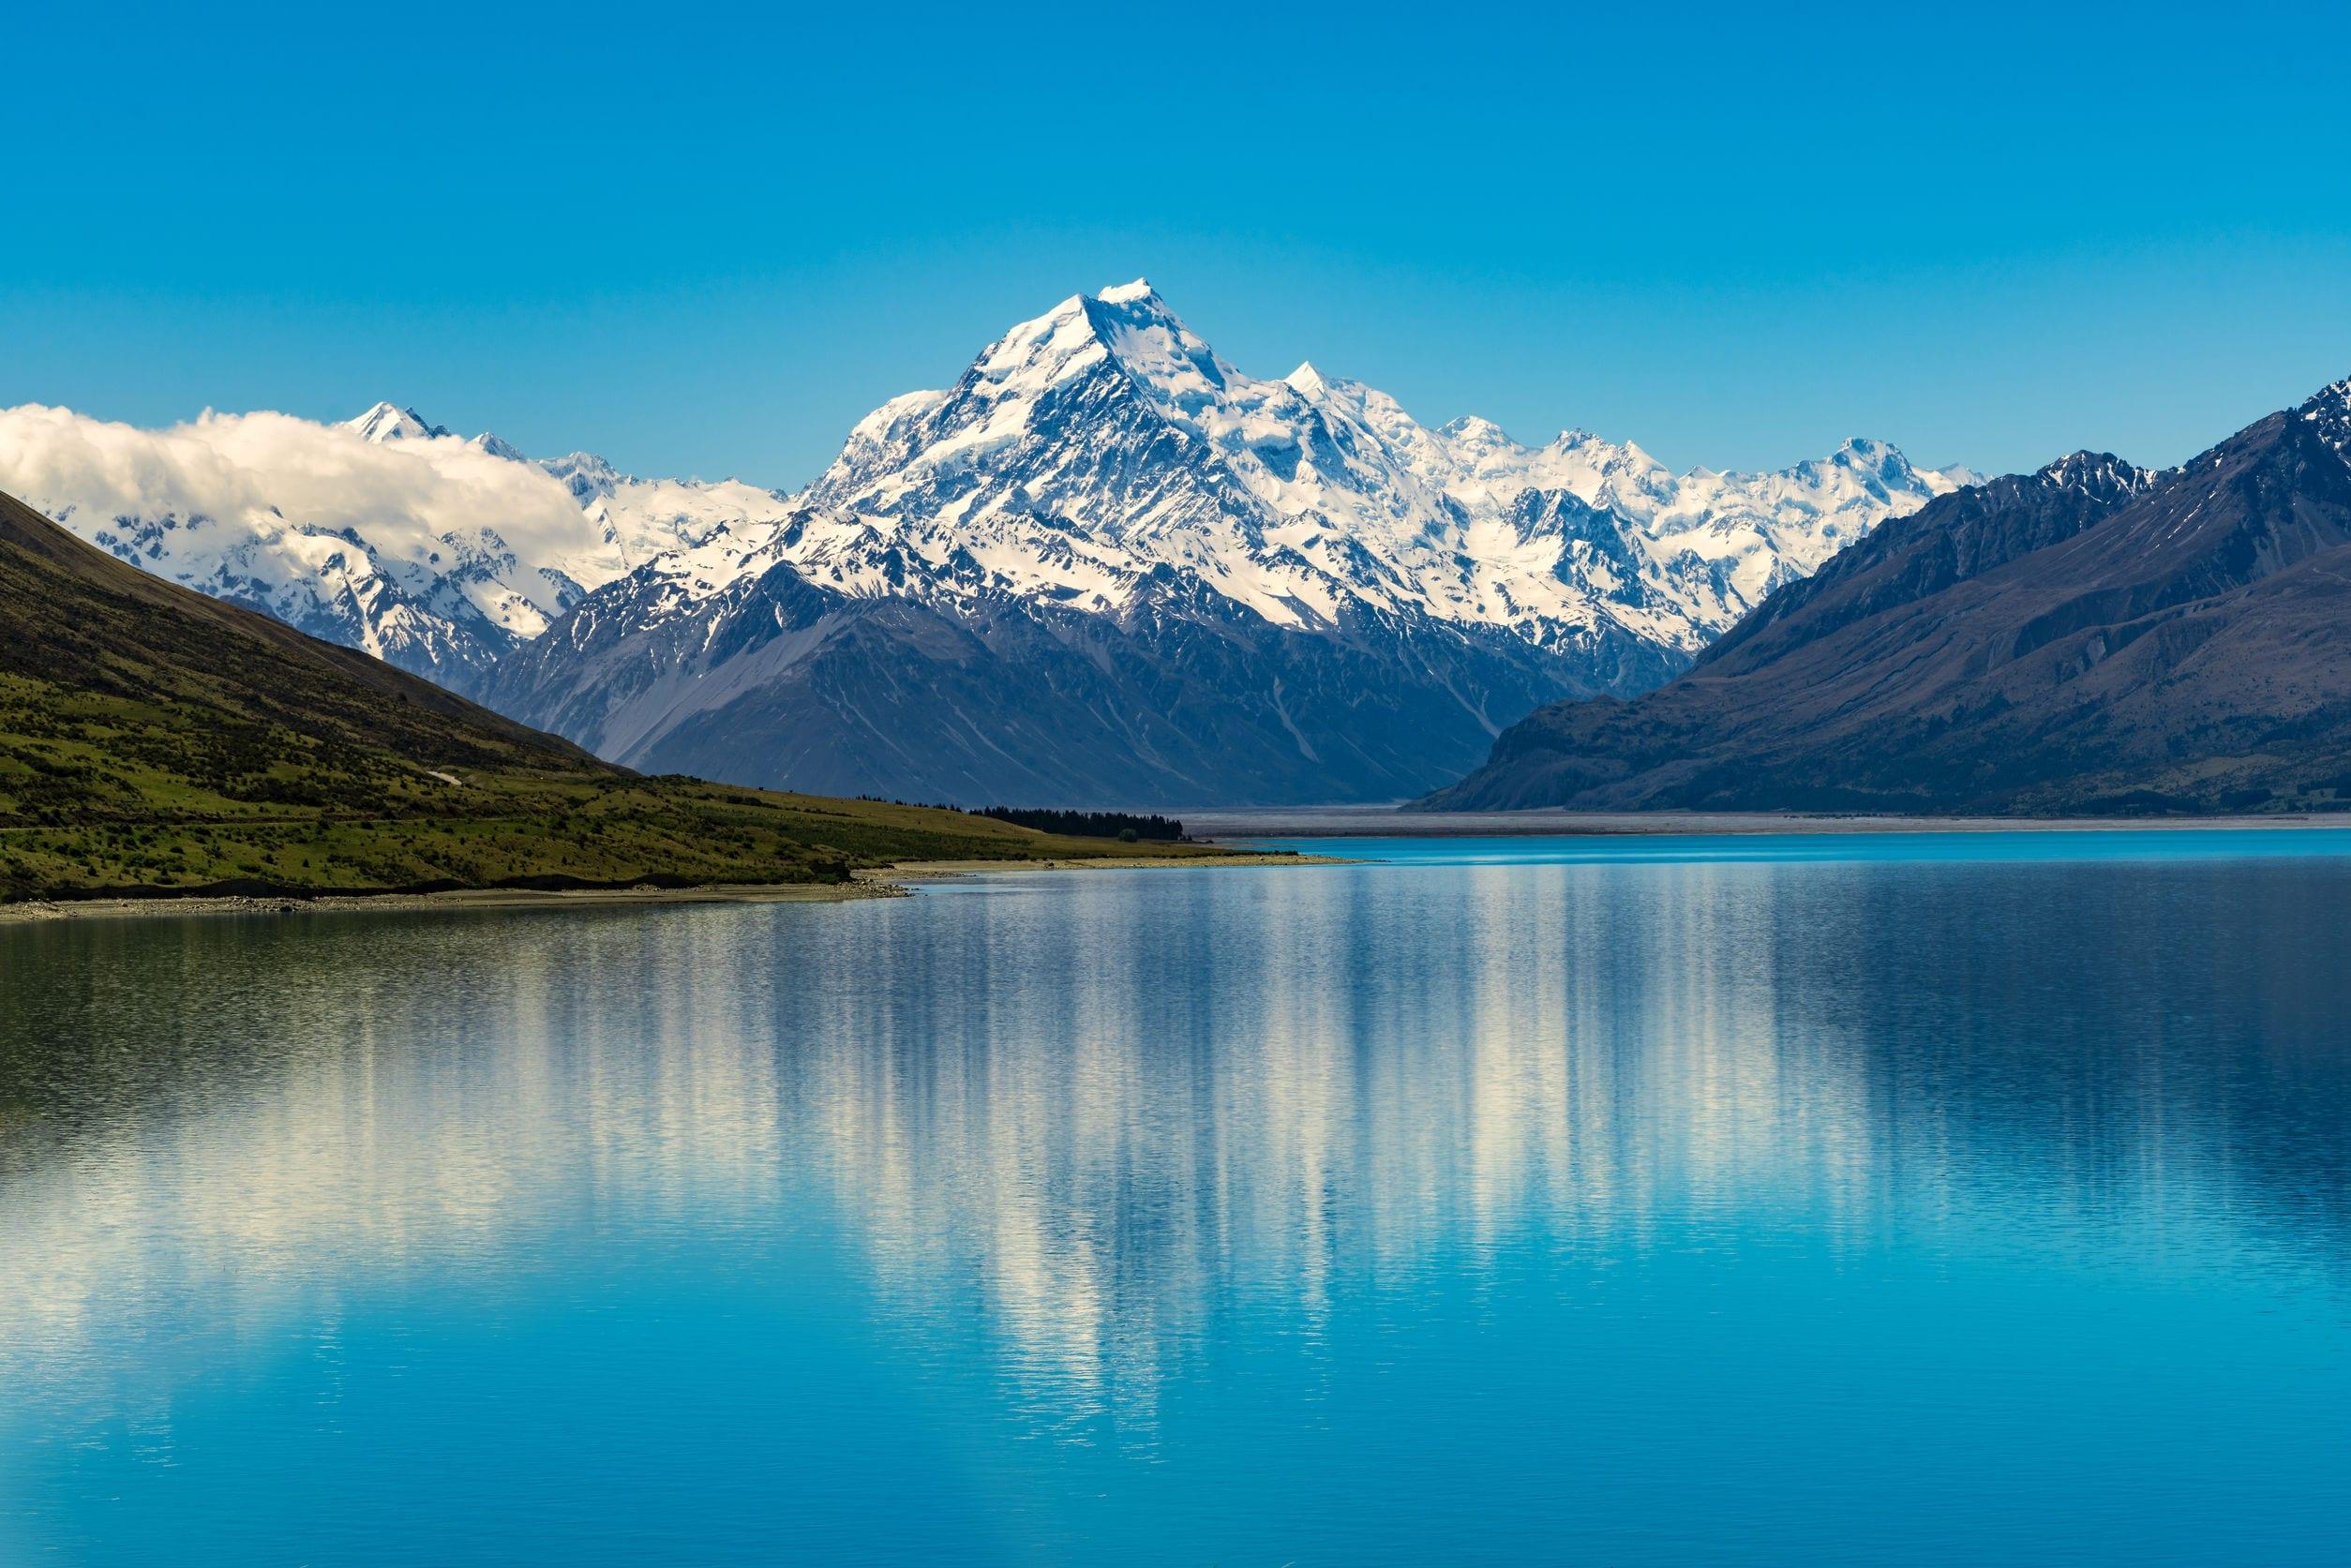 Australia & New Zealand Open World's Most Exclusive Travel Bubble